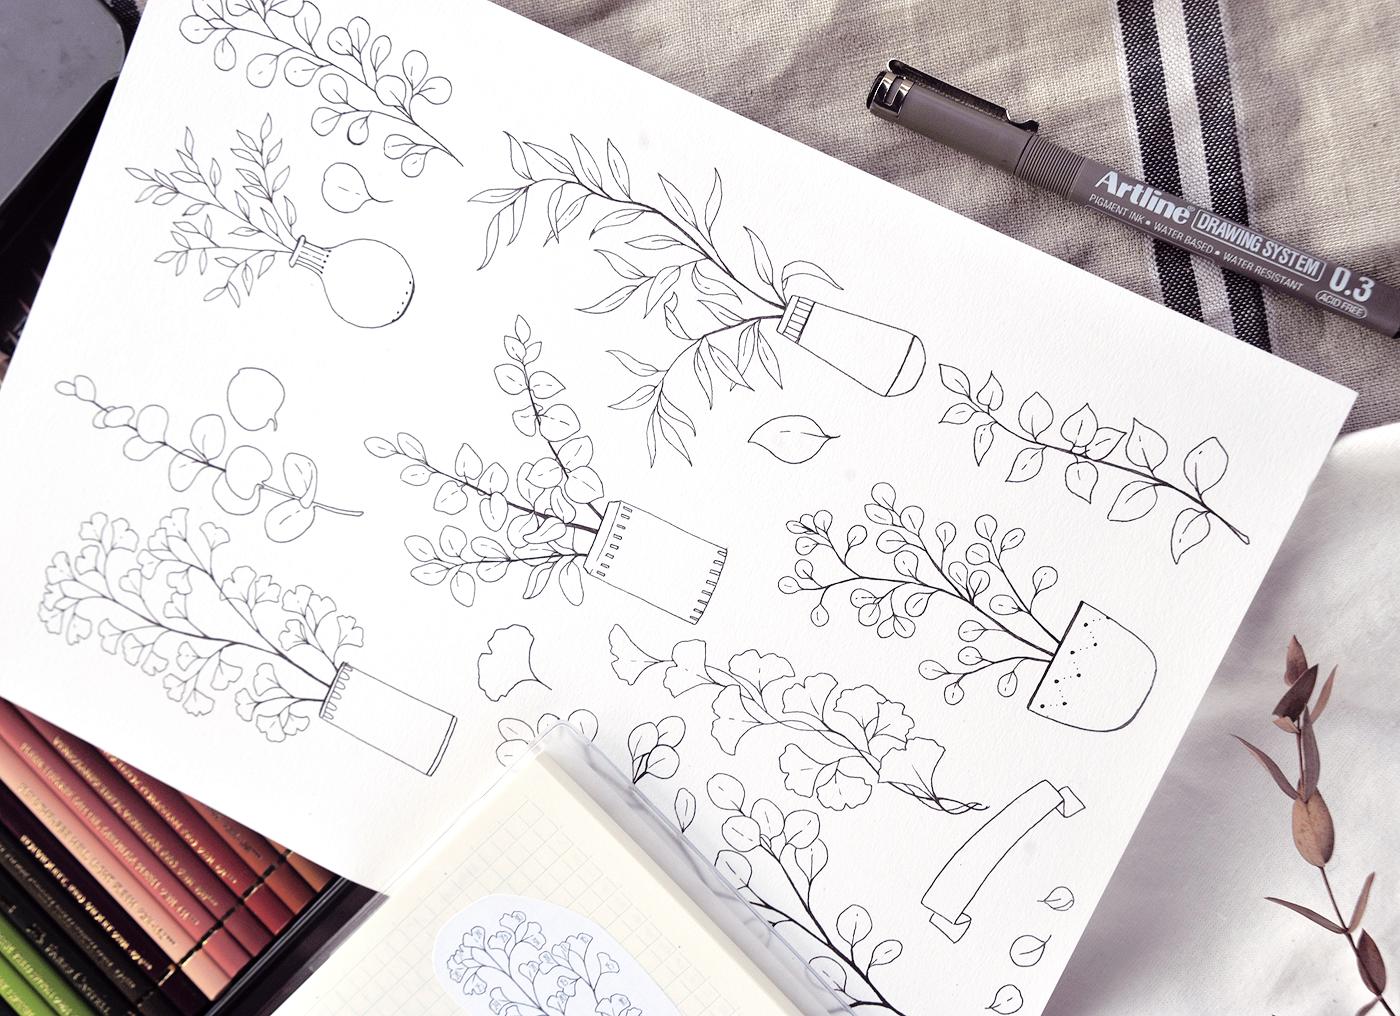 habittracker-moodtracker-drawing-doodle-bulletjournal.png